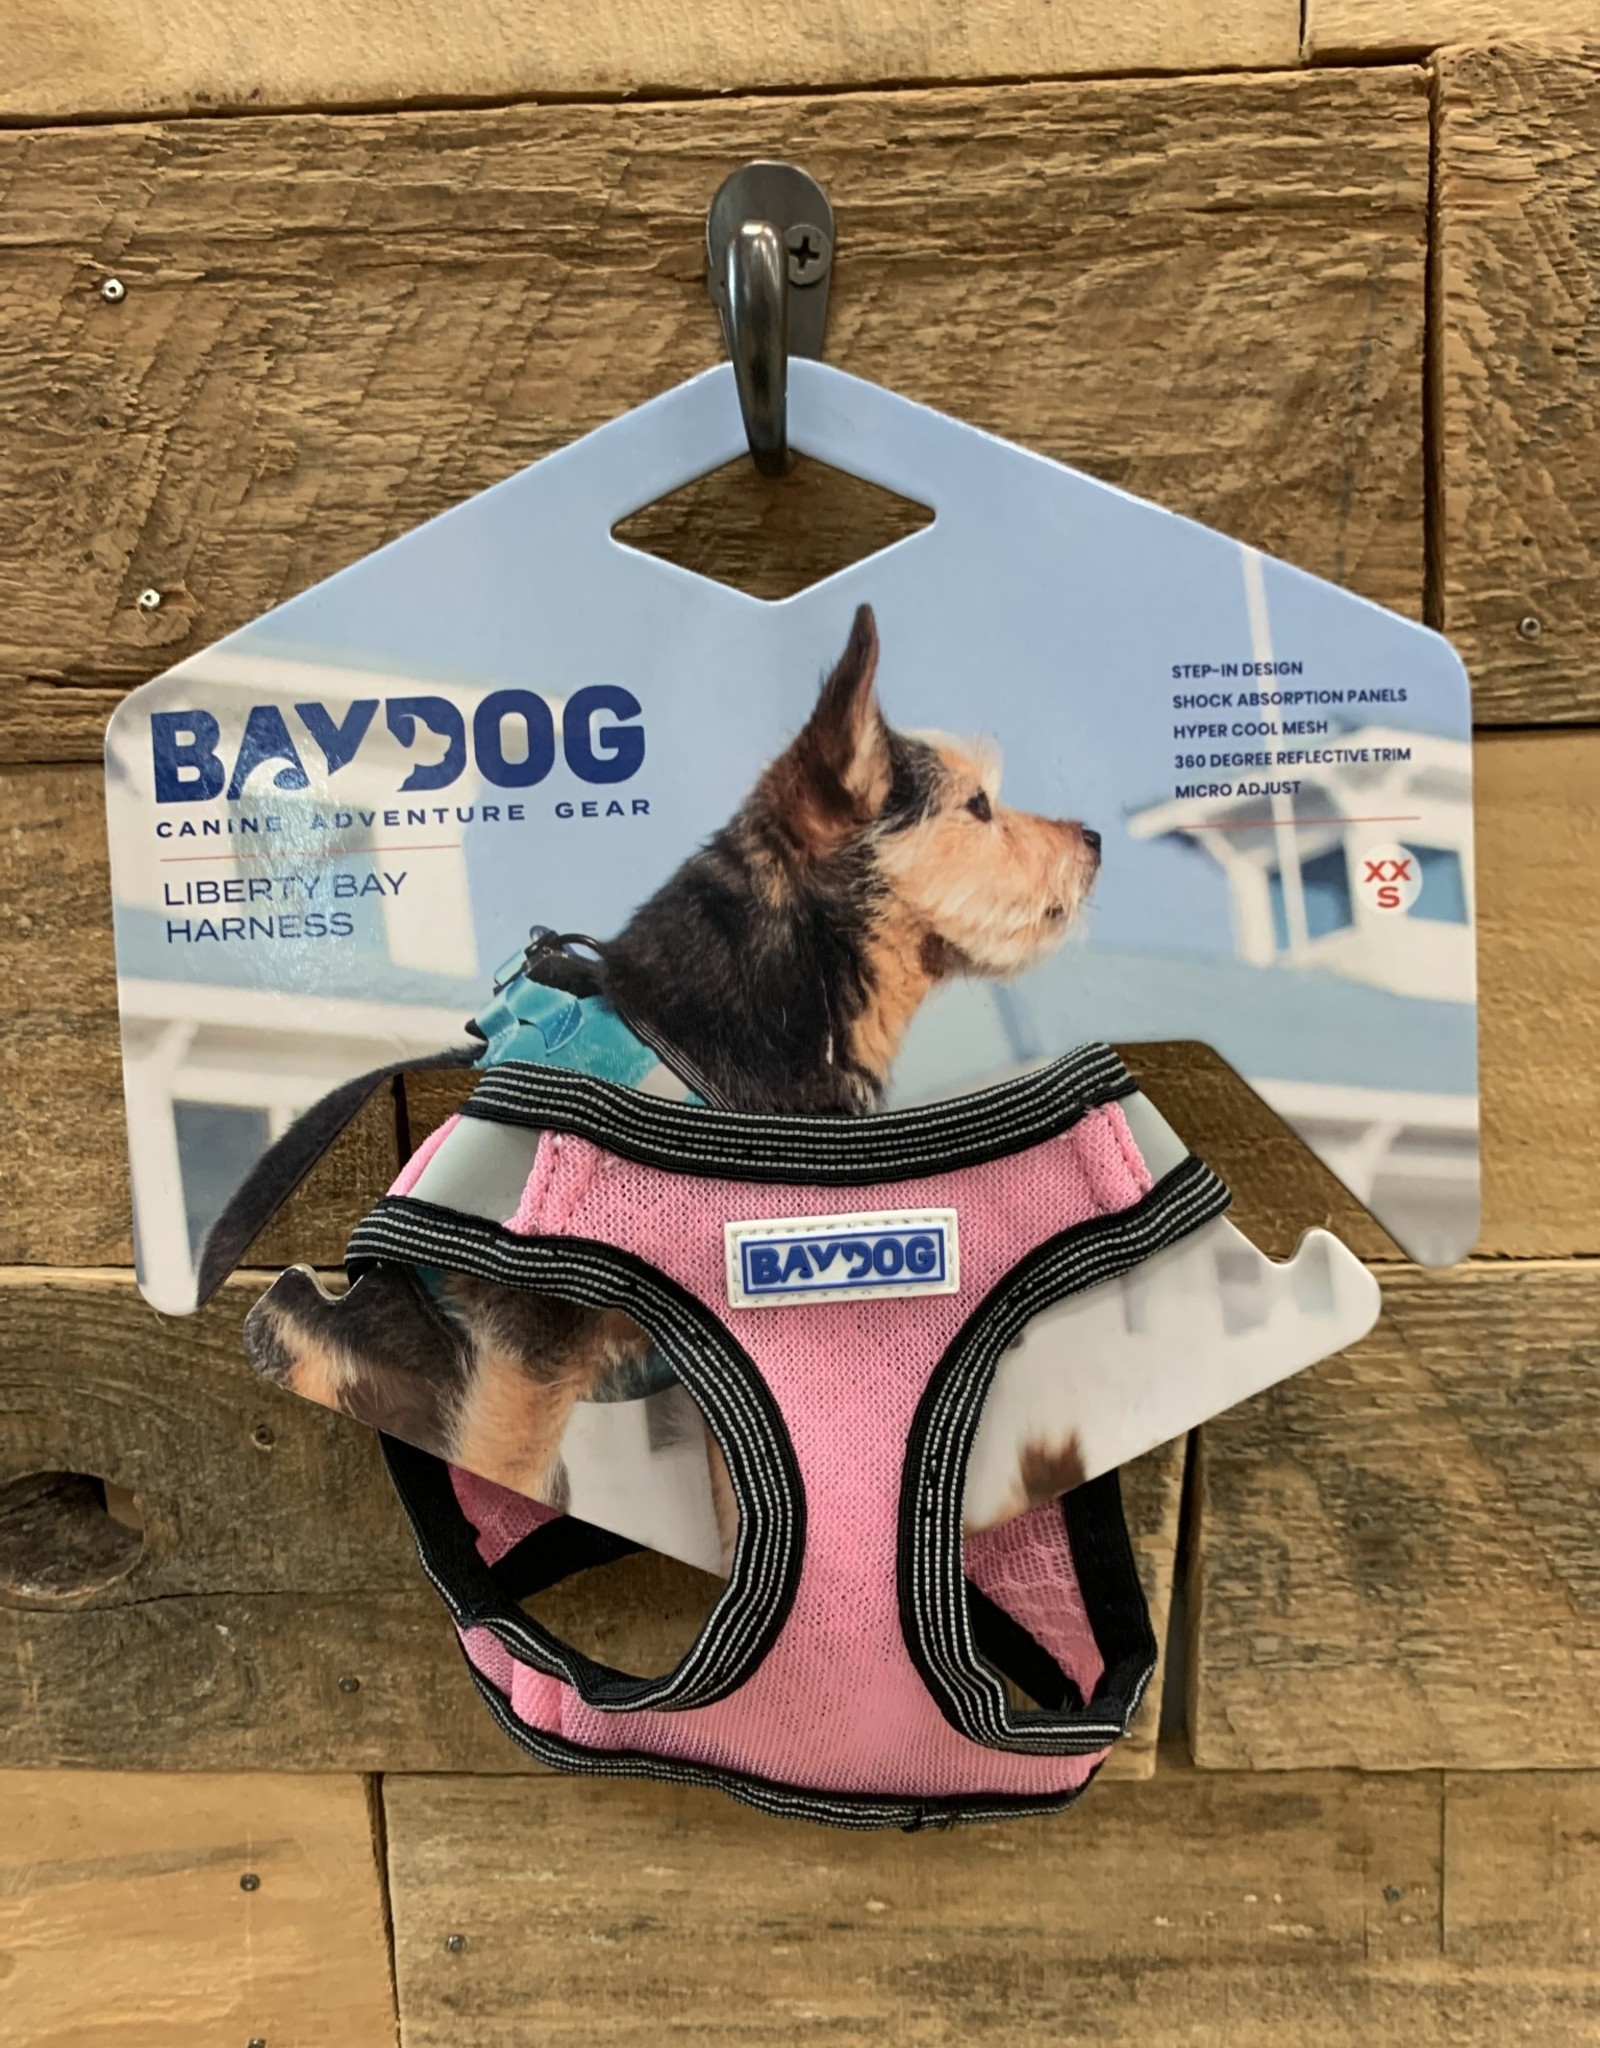 Baydog Baydog XX-Small Liberty Harness - 6 colors